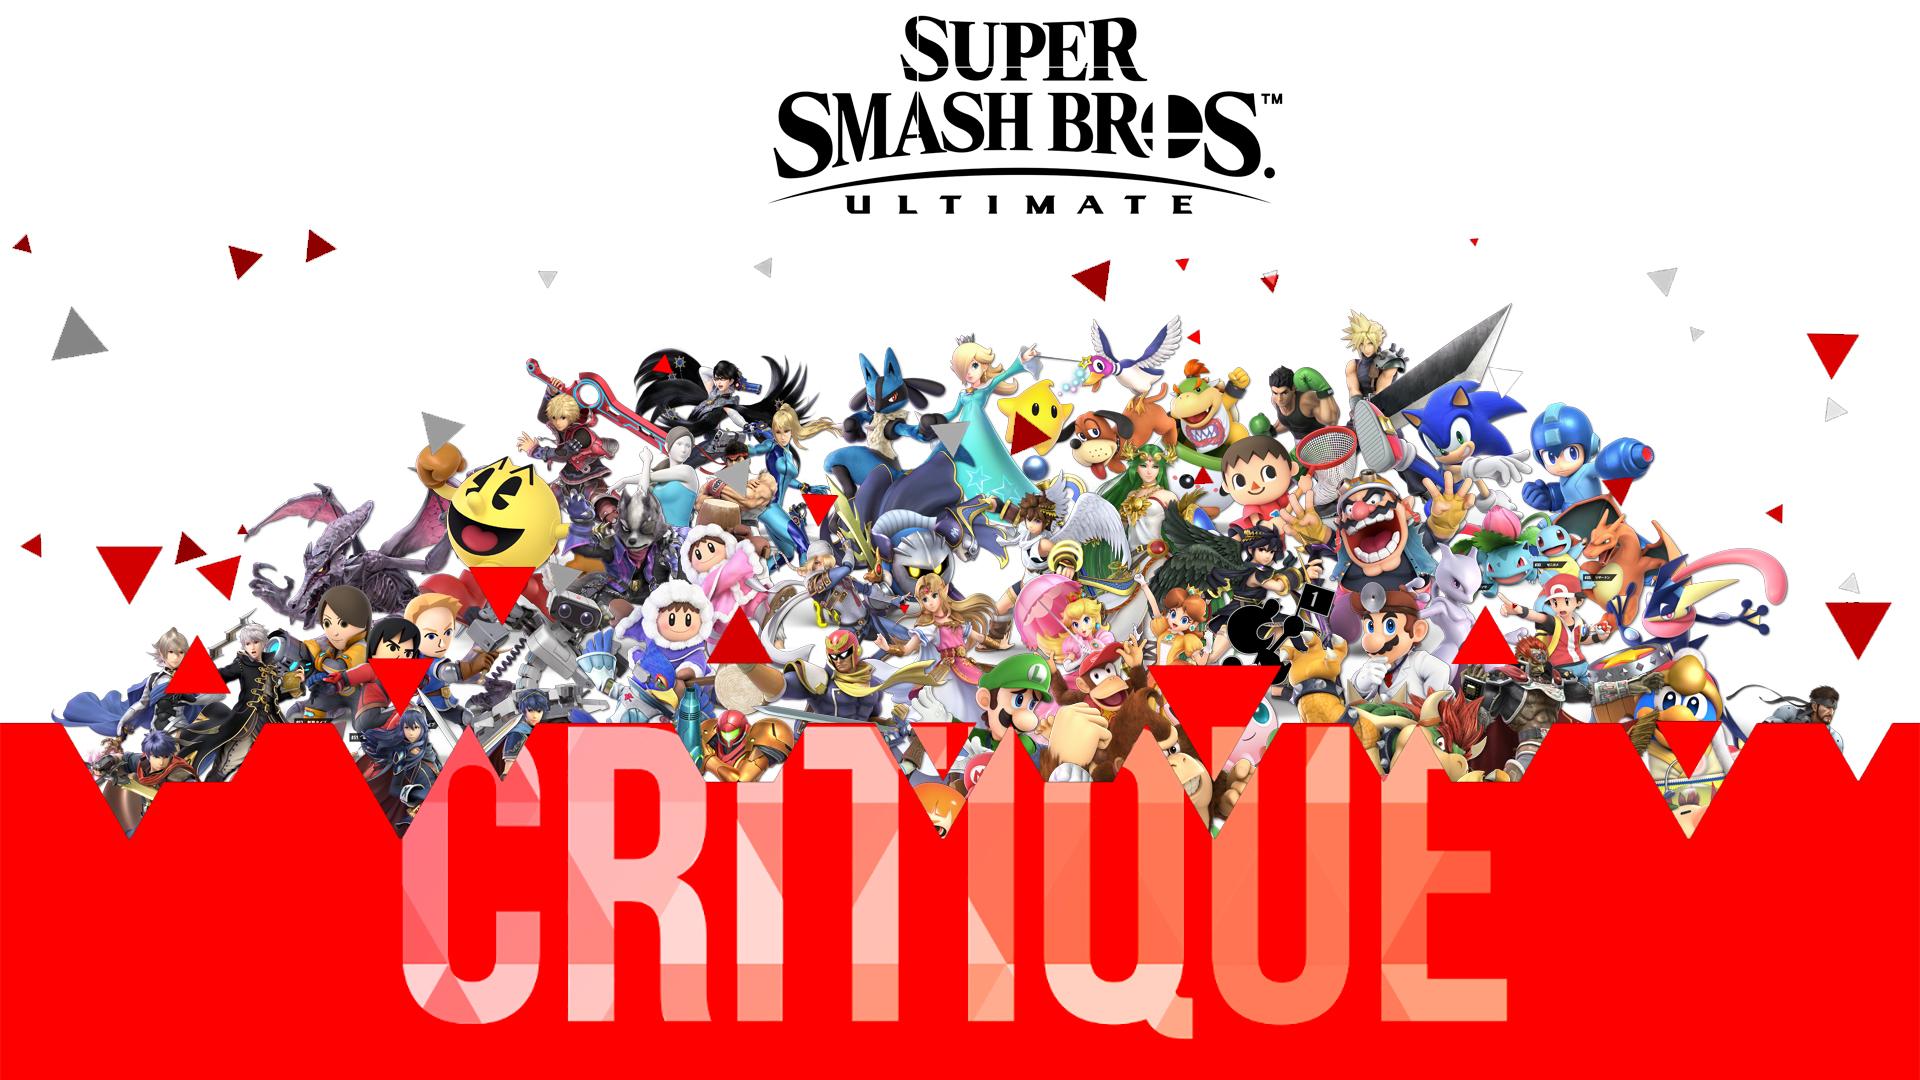 Critique Super Smash Bros Ultimate